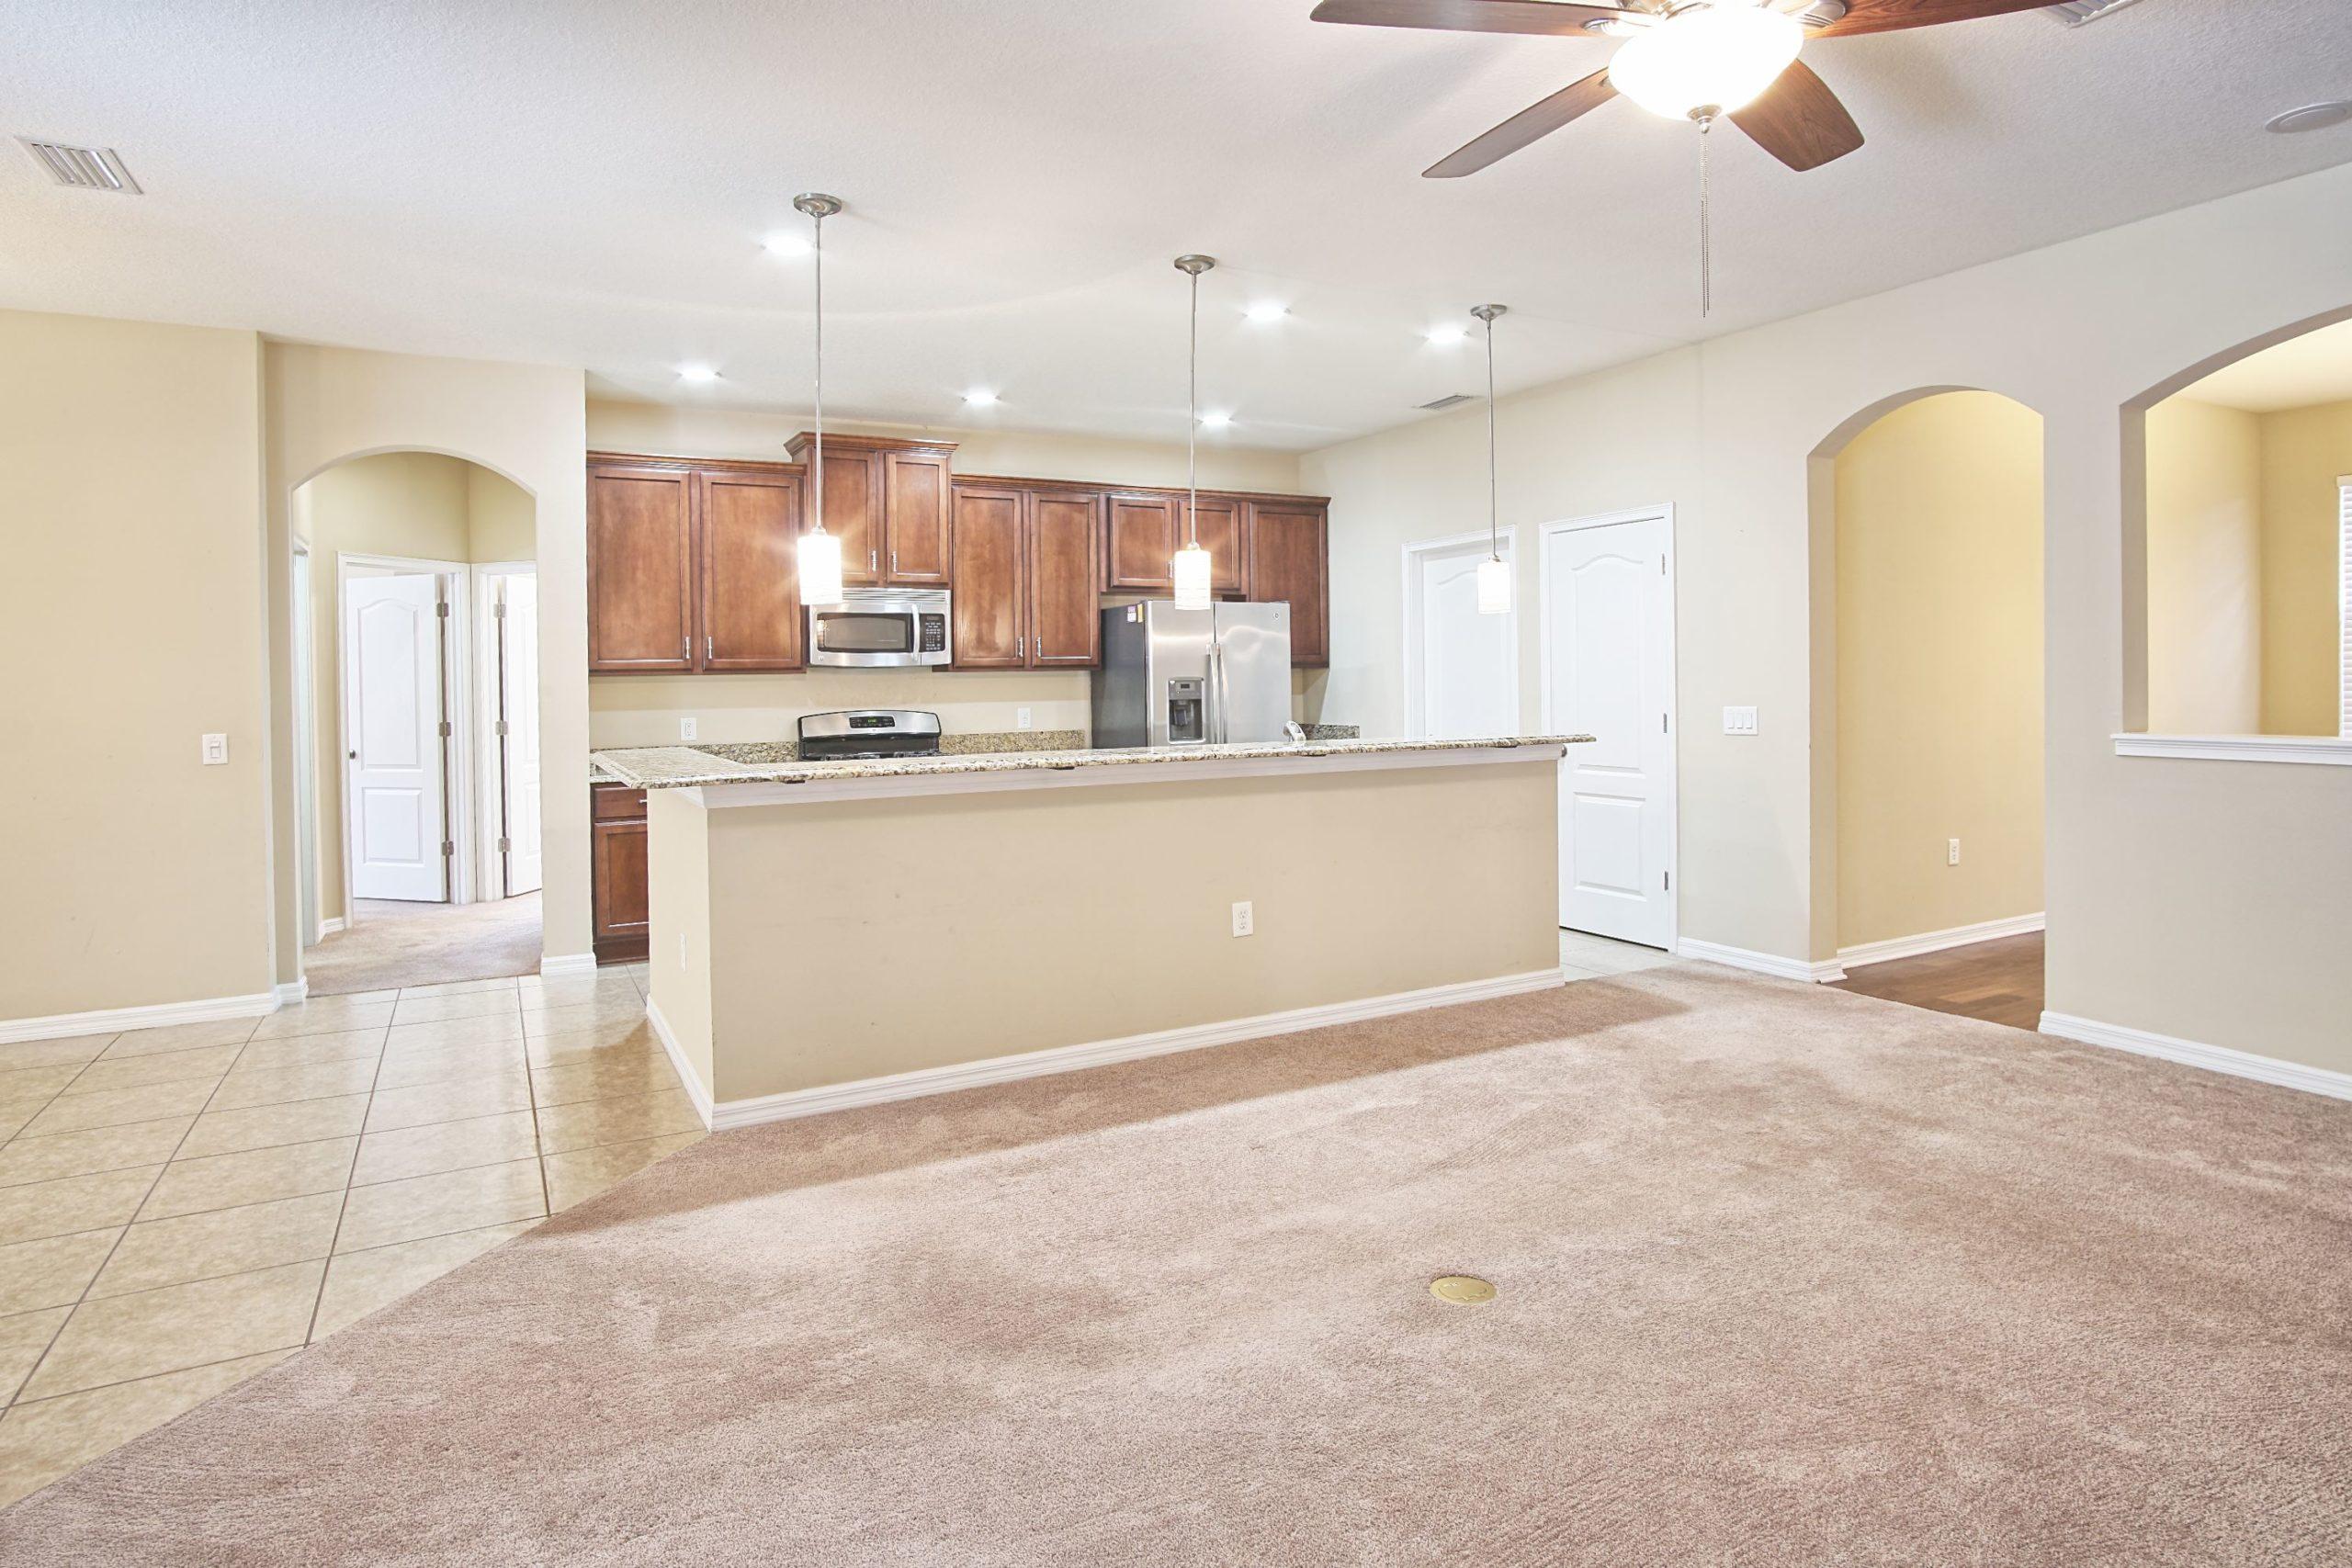 7905 Hamton Lake Dr, Tampa, Grand Hampton, new 2020 (28)